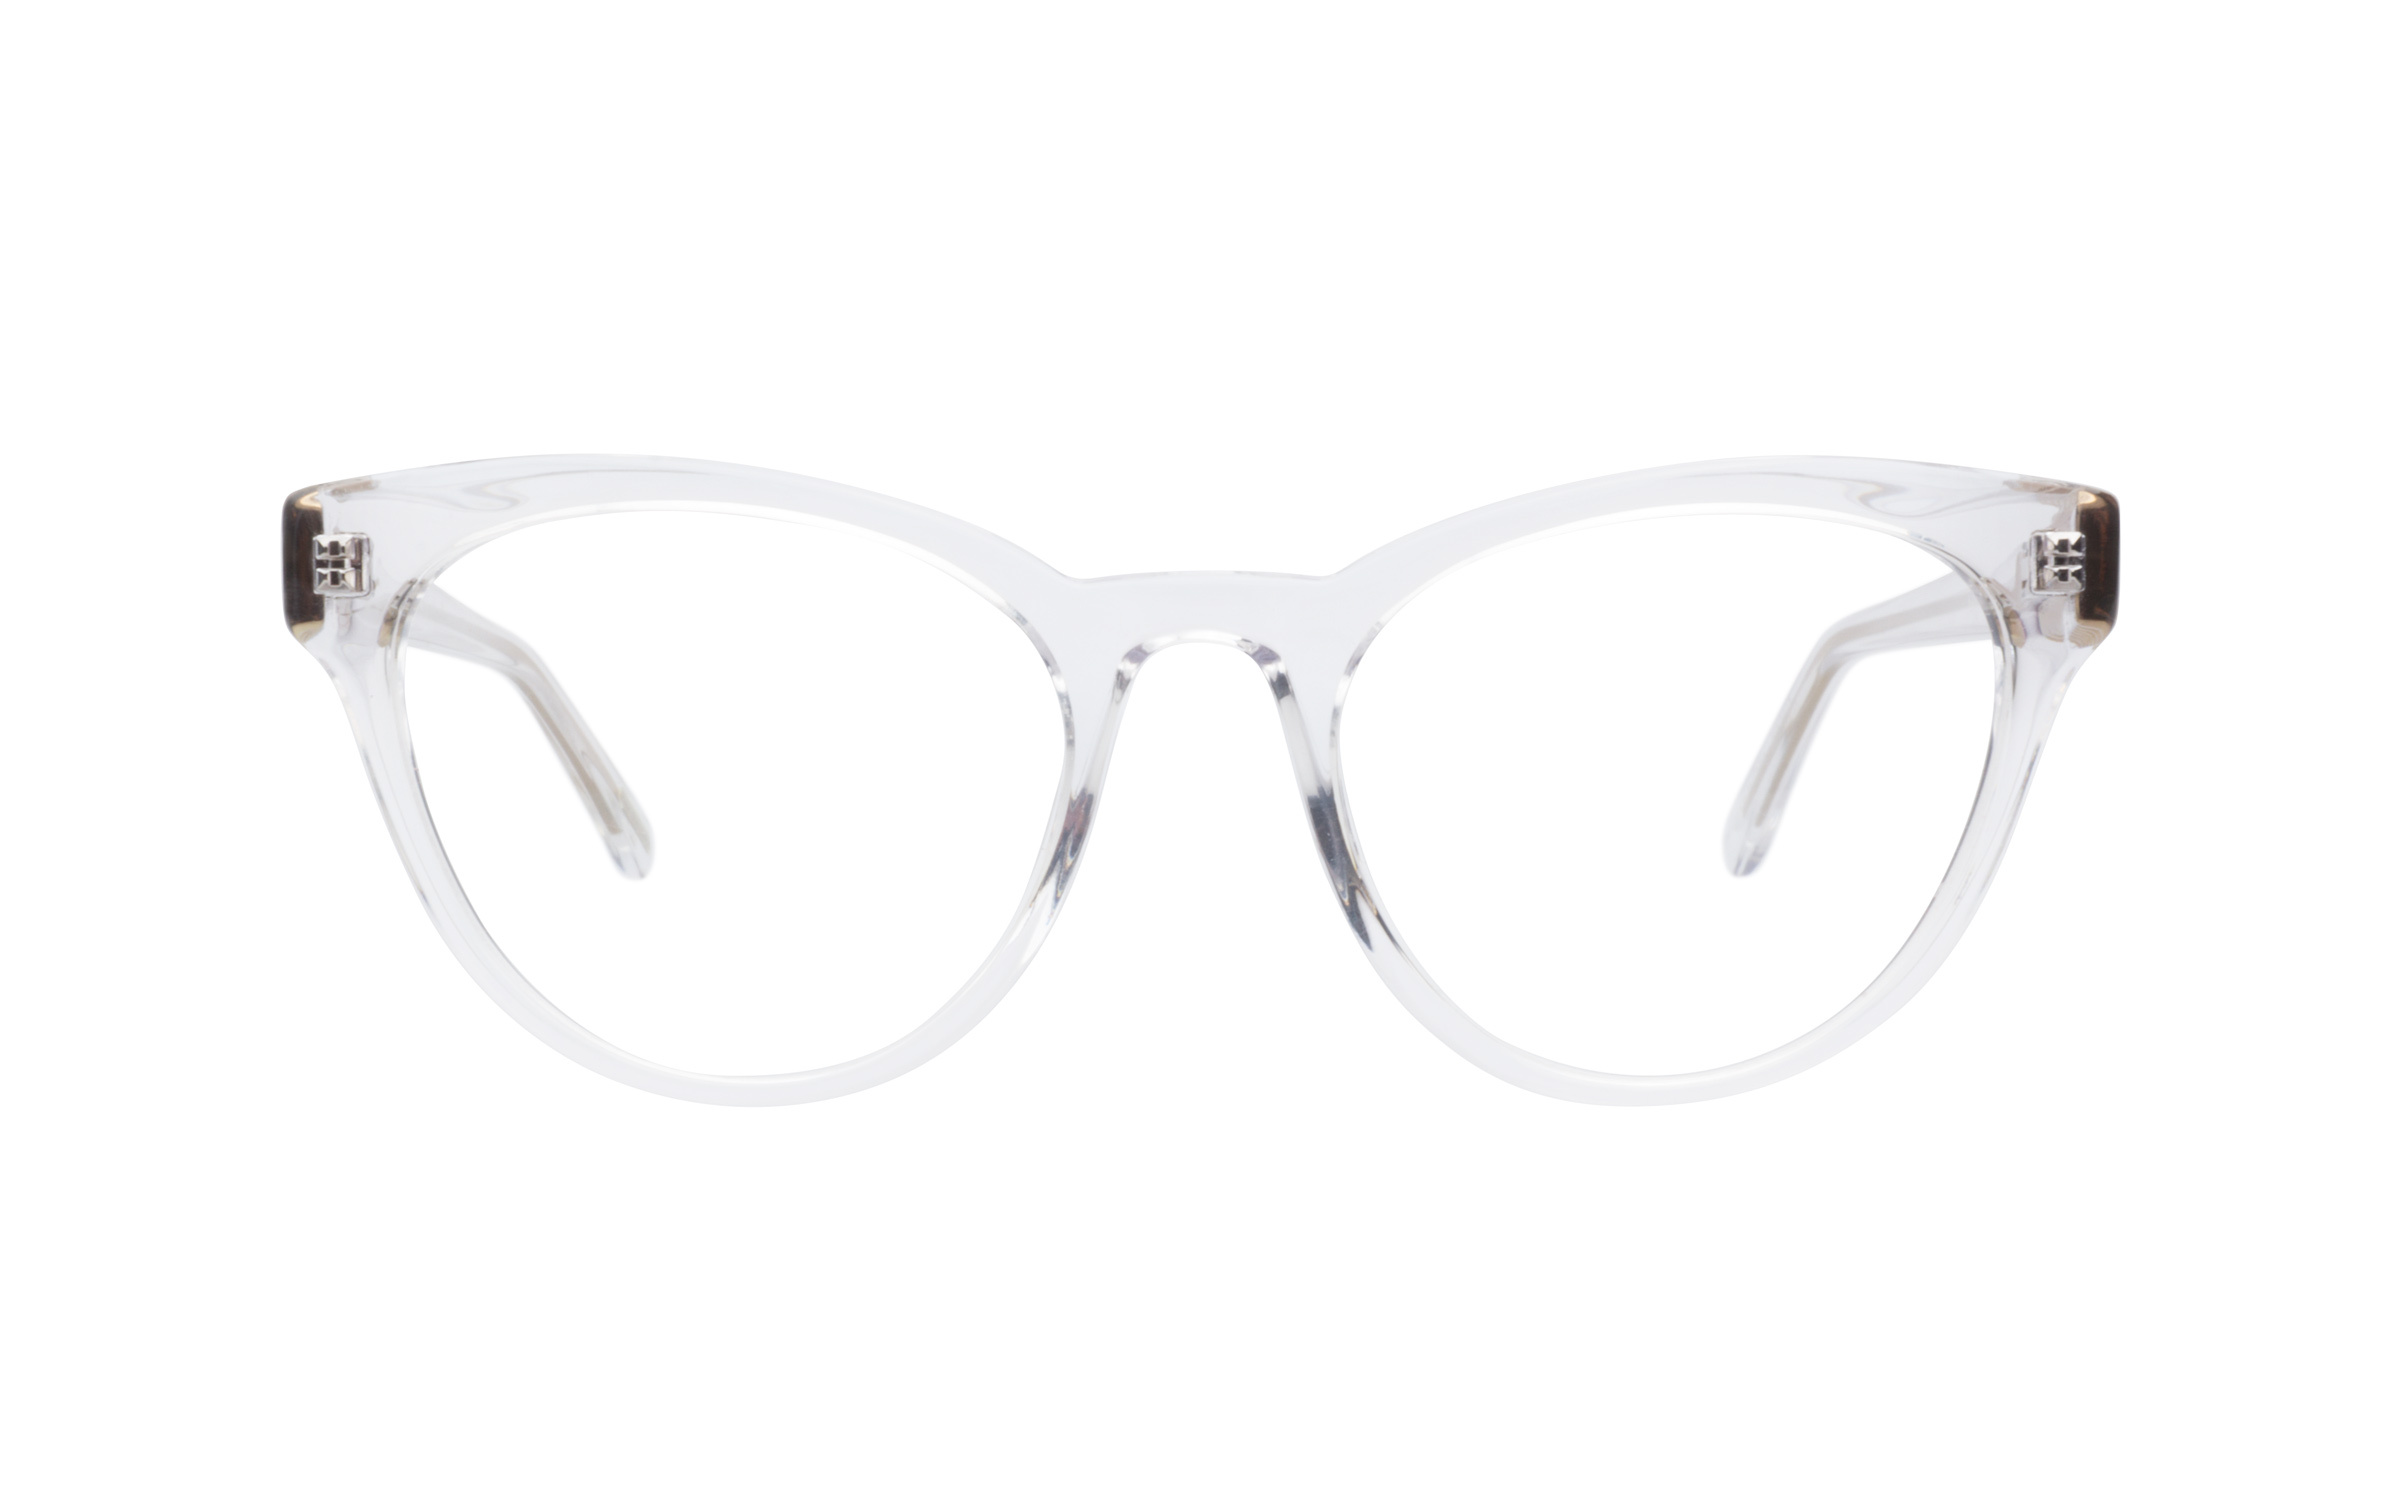 Kam_Dhillon_Womens_Glasses_CatEye_Clear_AcetateMetal_Online_Coastal